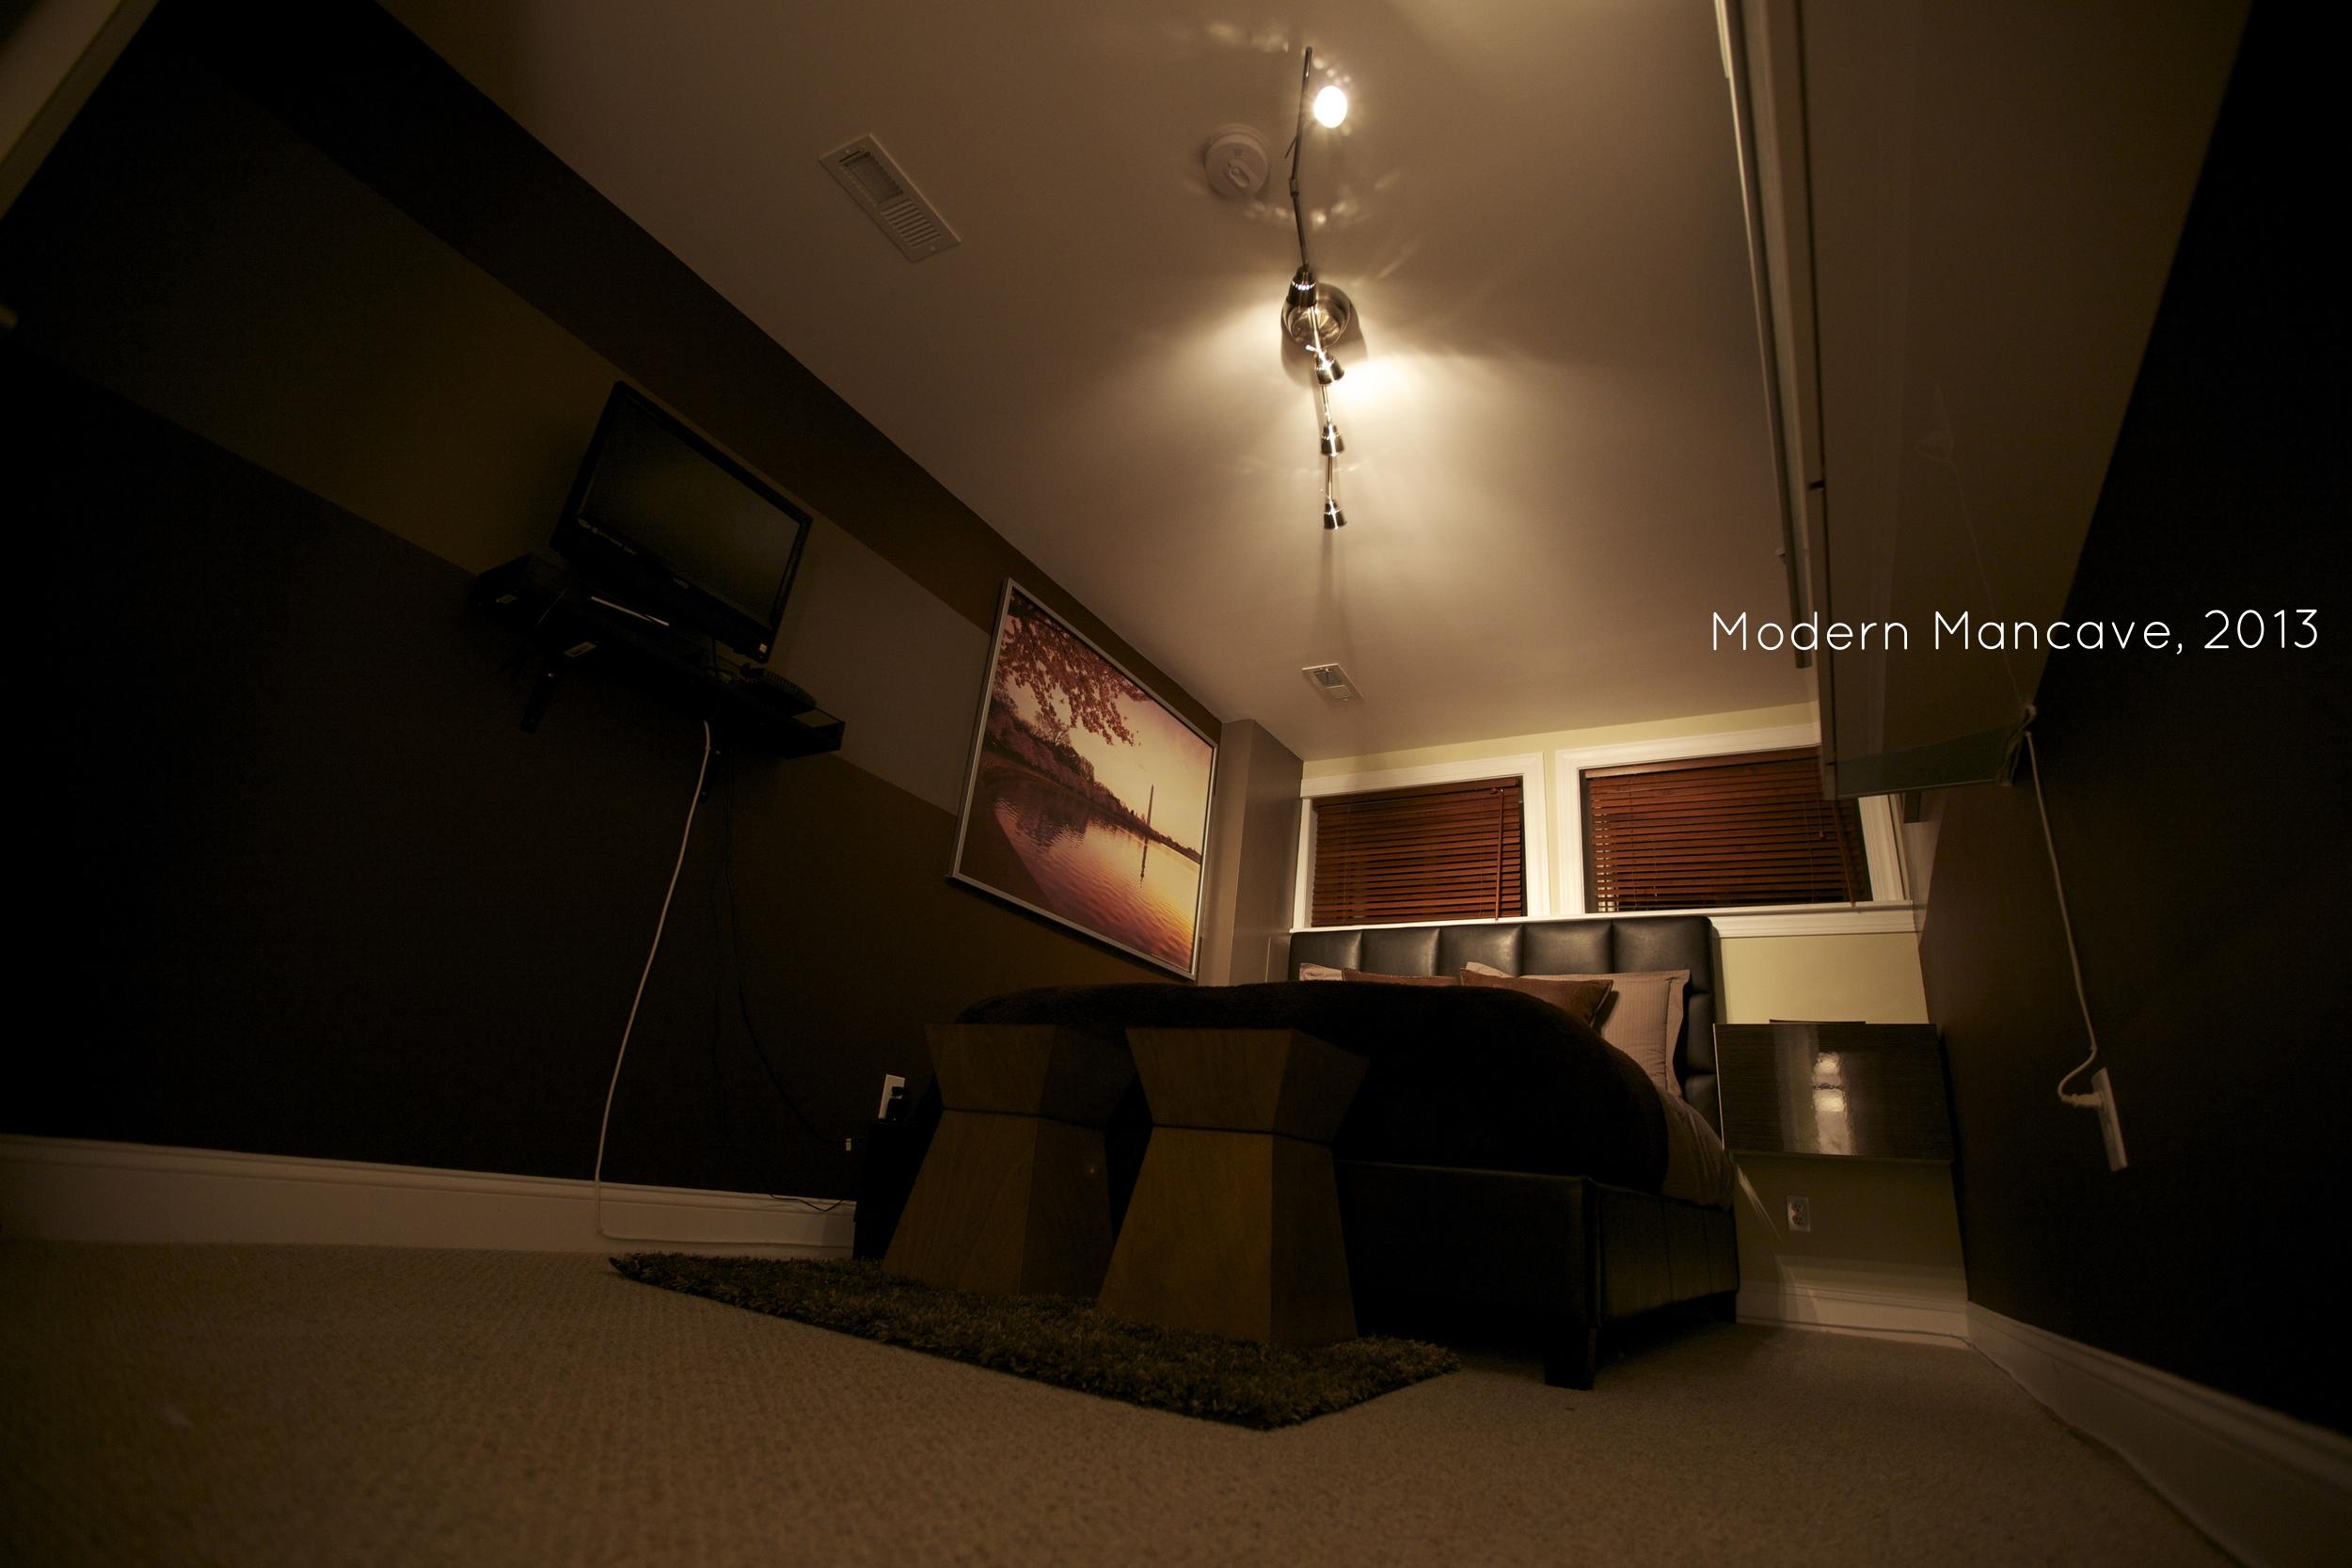 The Modern Mancave